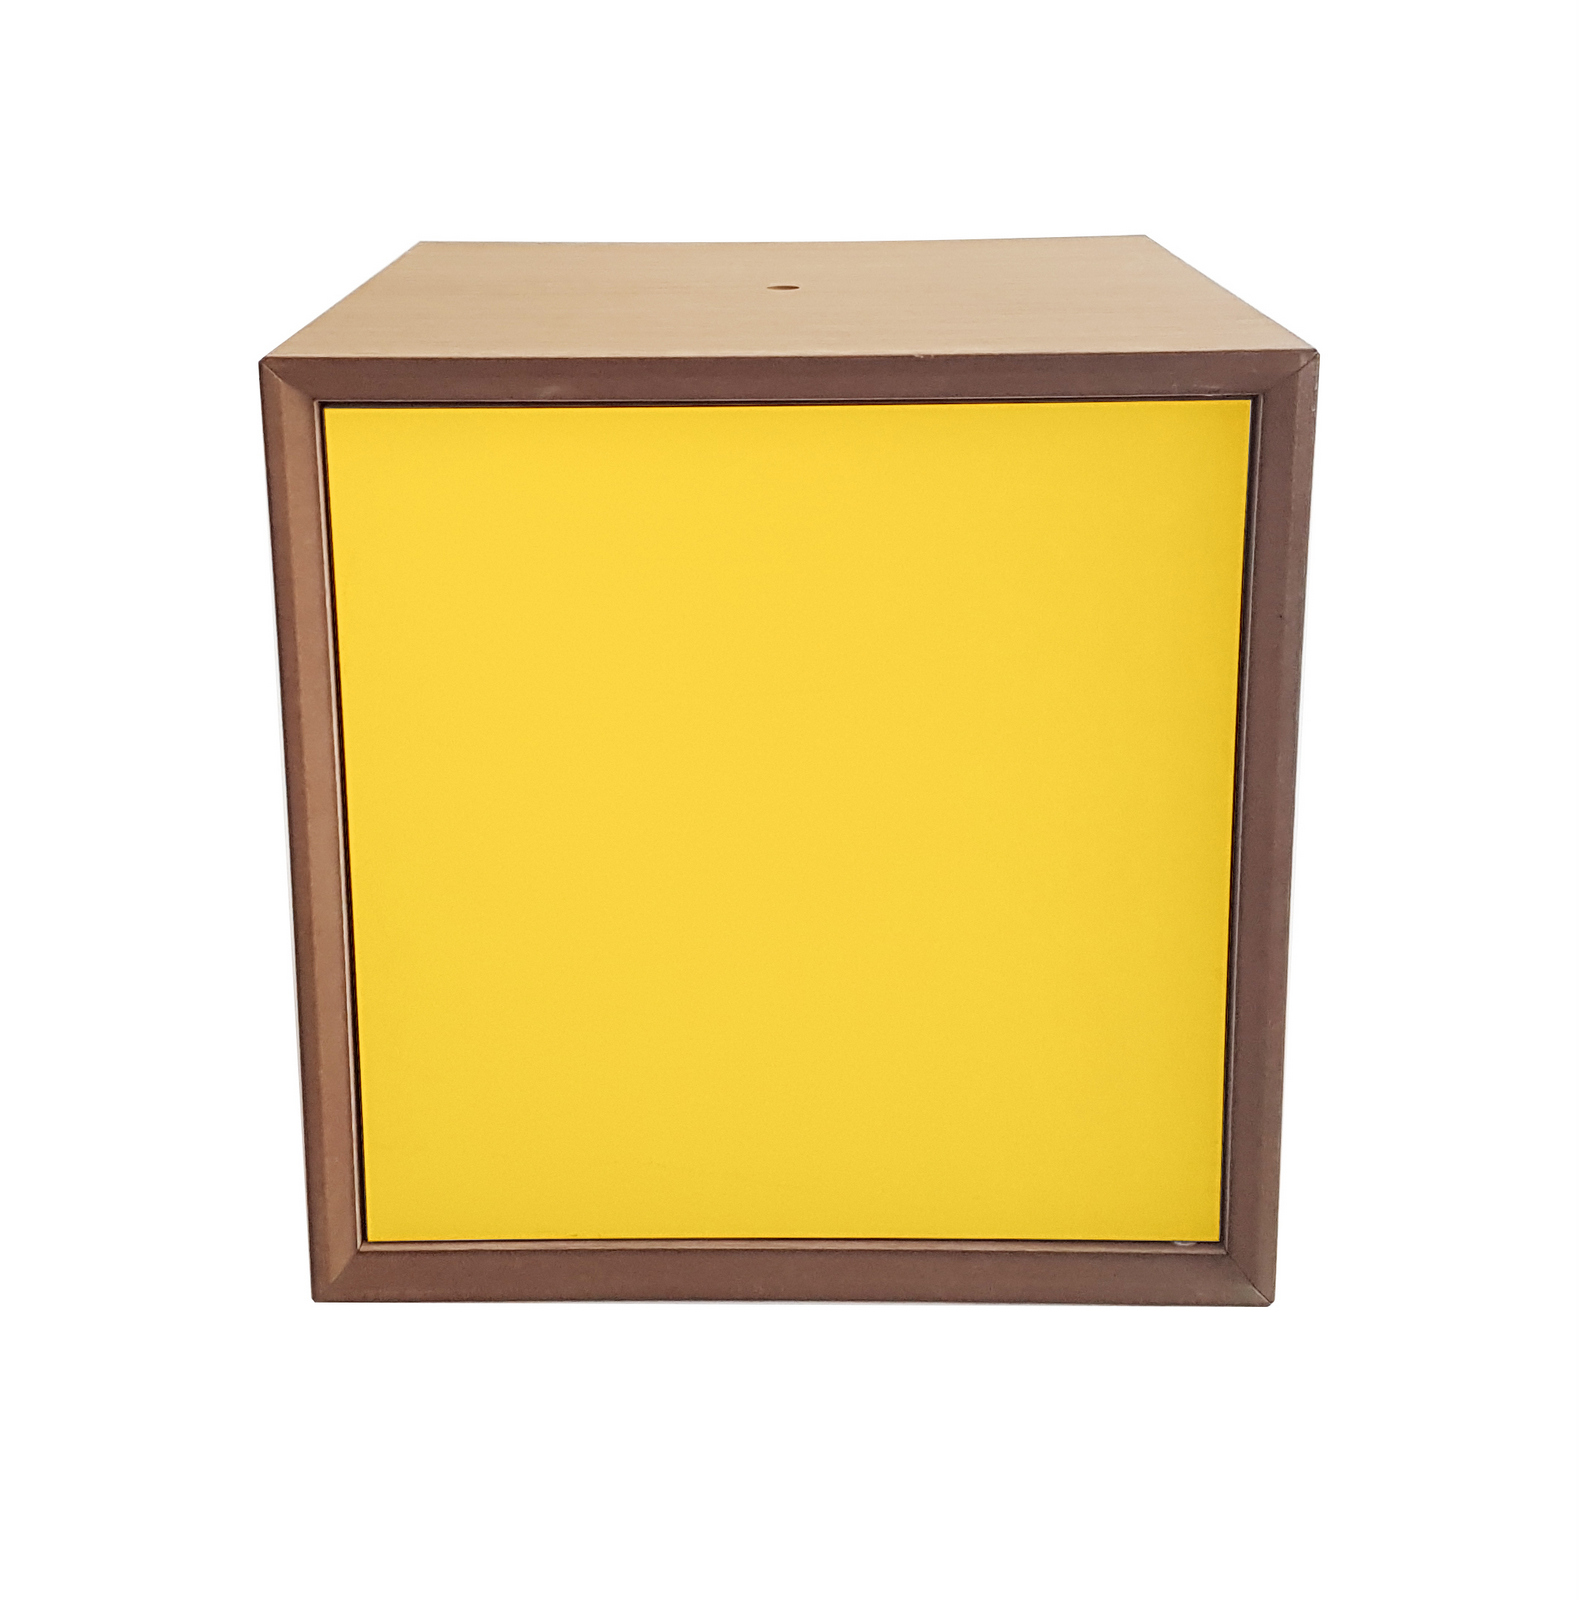 Dulap modular Pixel Yellow l40xA40xH40 cm